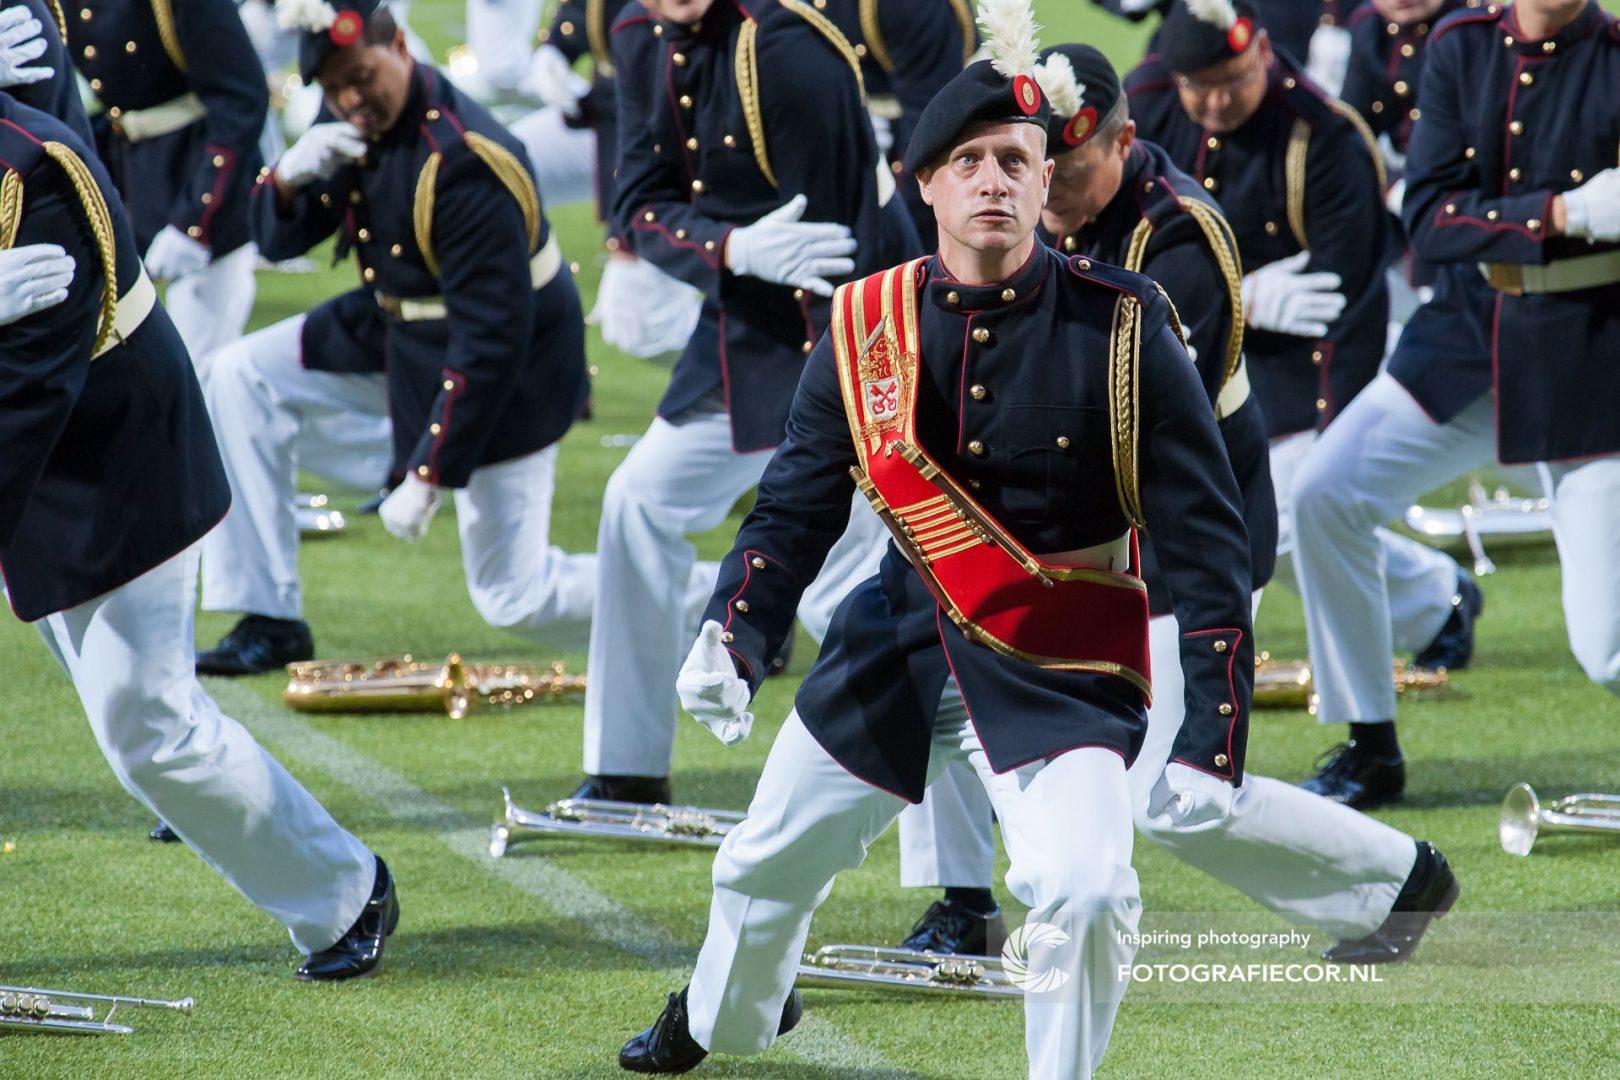 muziek   show   Parade   Korpsmuziek   Marchingband